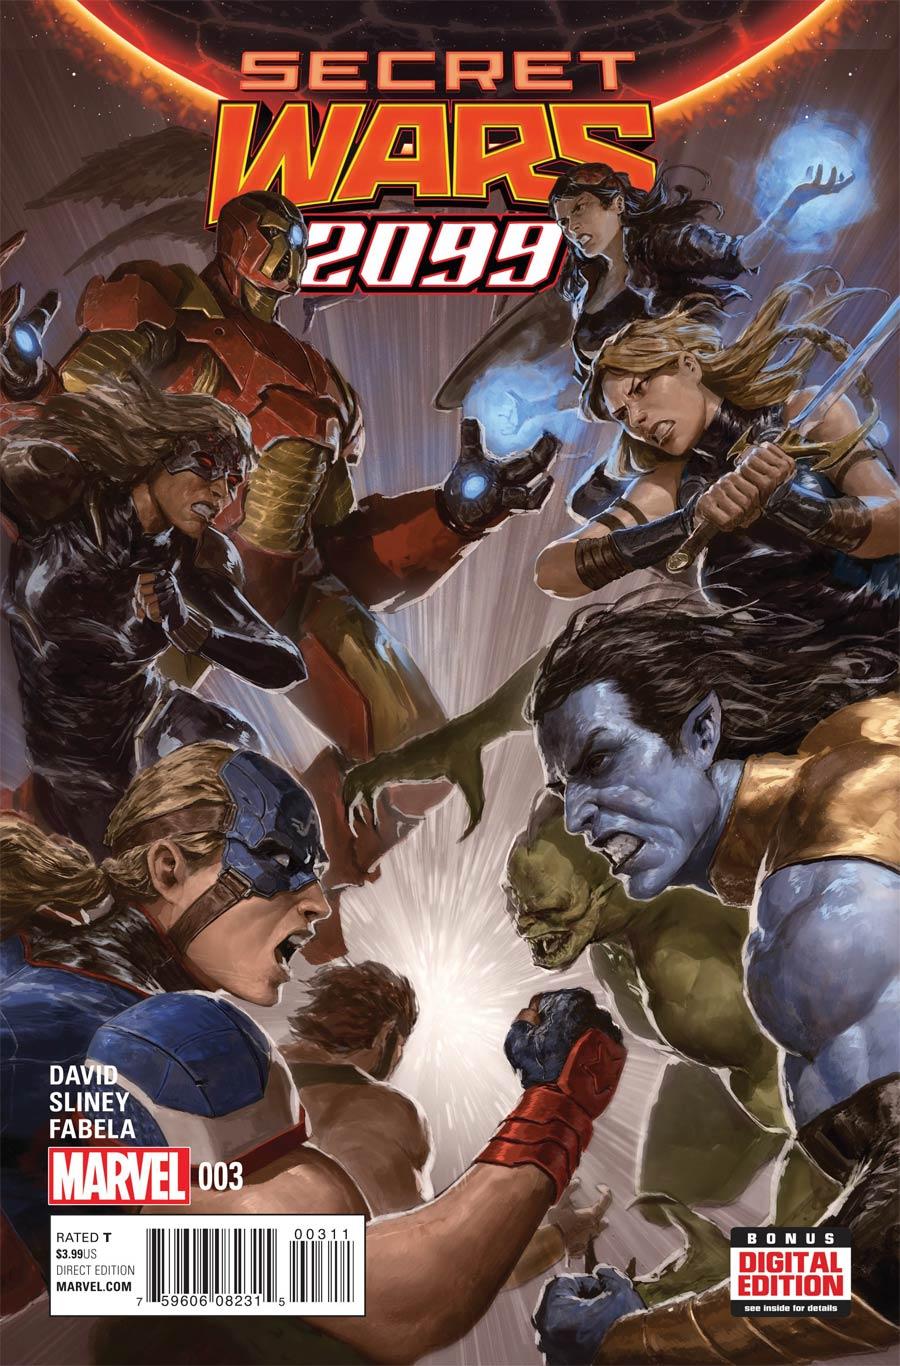 Secret Wars 2099 #3 Cover A Regular Dave Rapoza Cover (Secret Wars Warzones Tie-In)